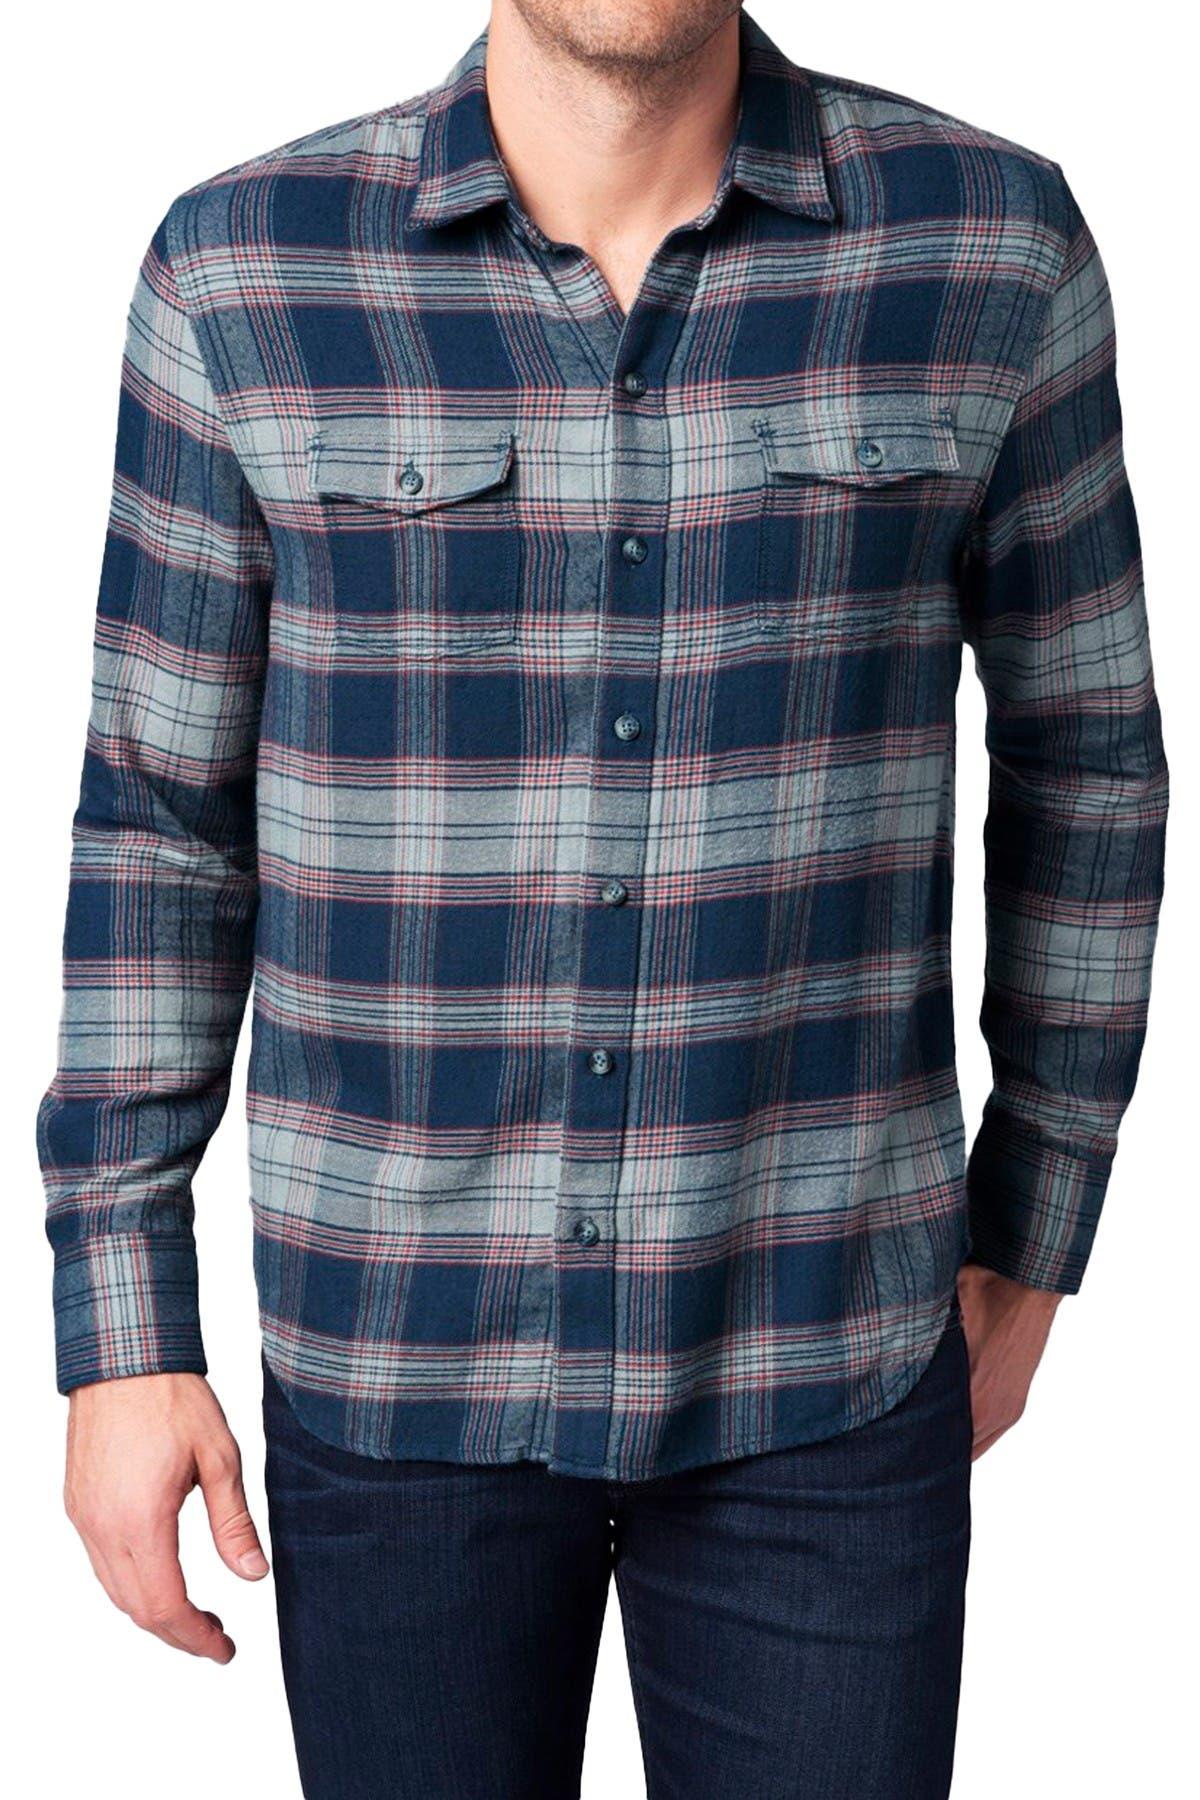 Image of PAIGE Everett Plaid Shirt